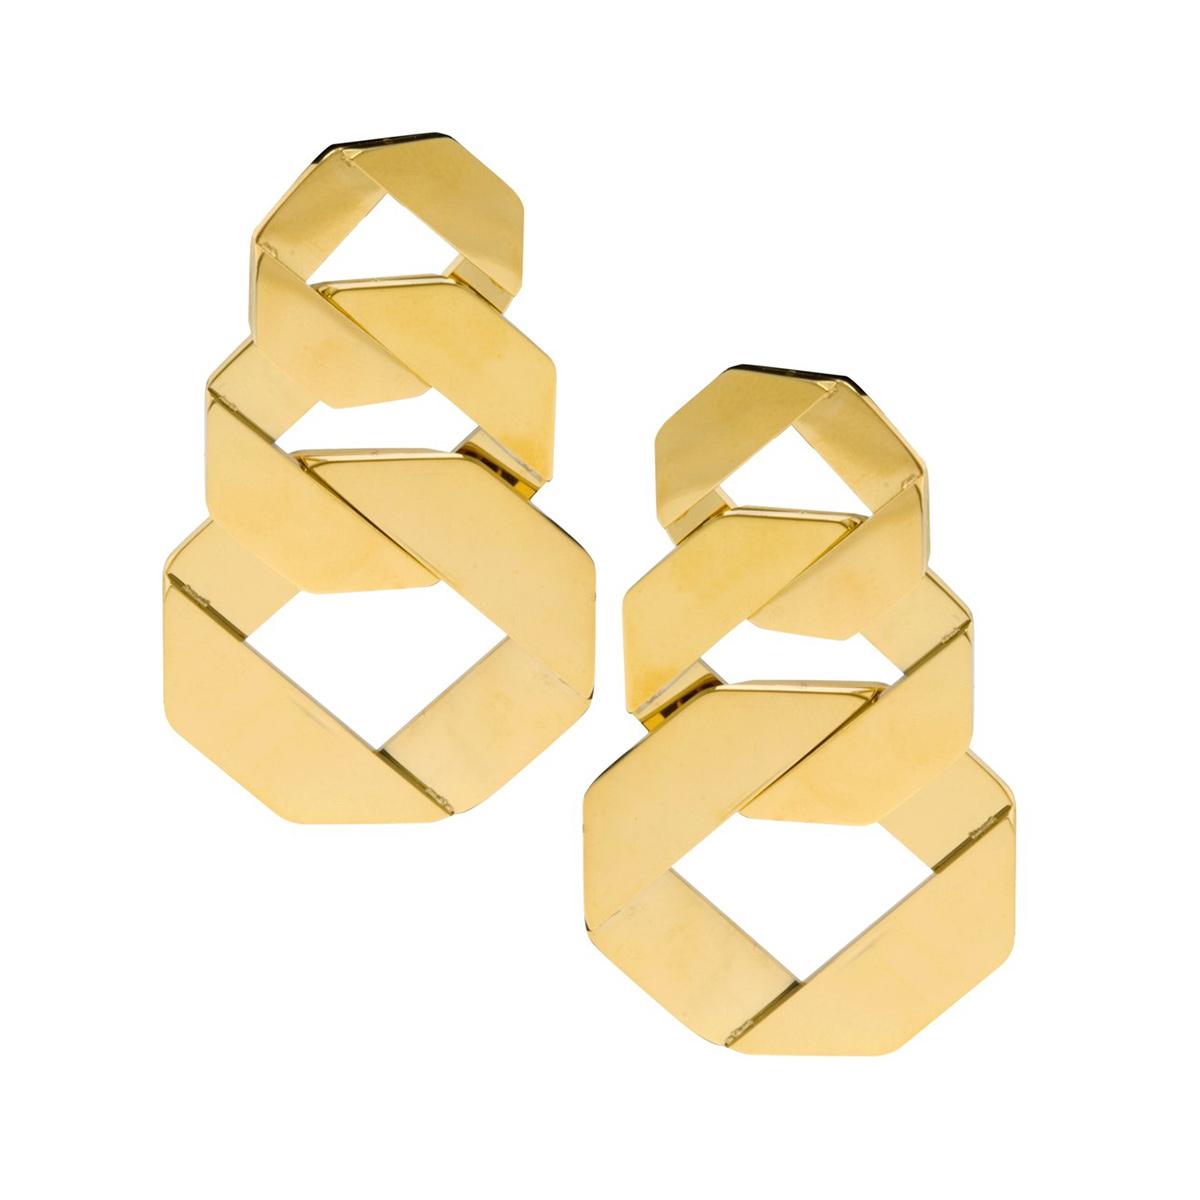 Bonnie-earring-gold